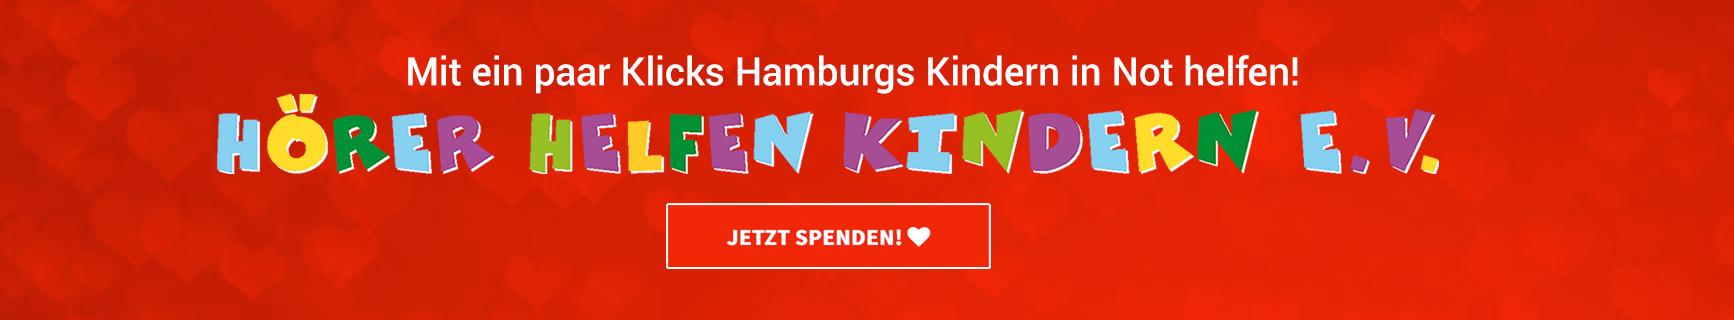 src=https://www.hoerer-helfen-kindern.de/wp-content/uploads/2019/01/HHK_Spenden-Banner-allgemein.jpg